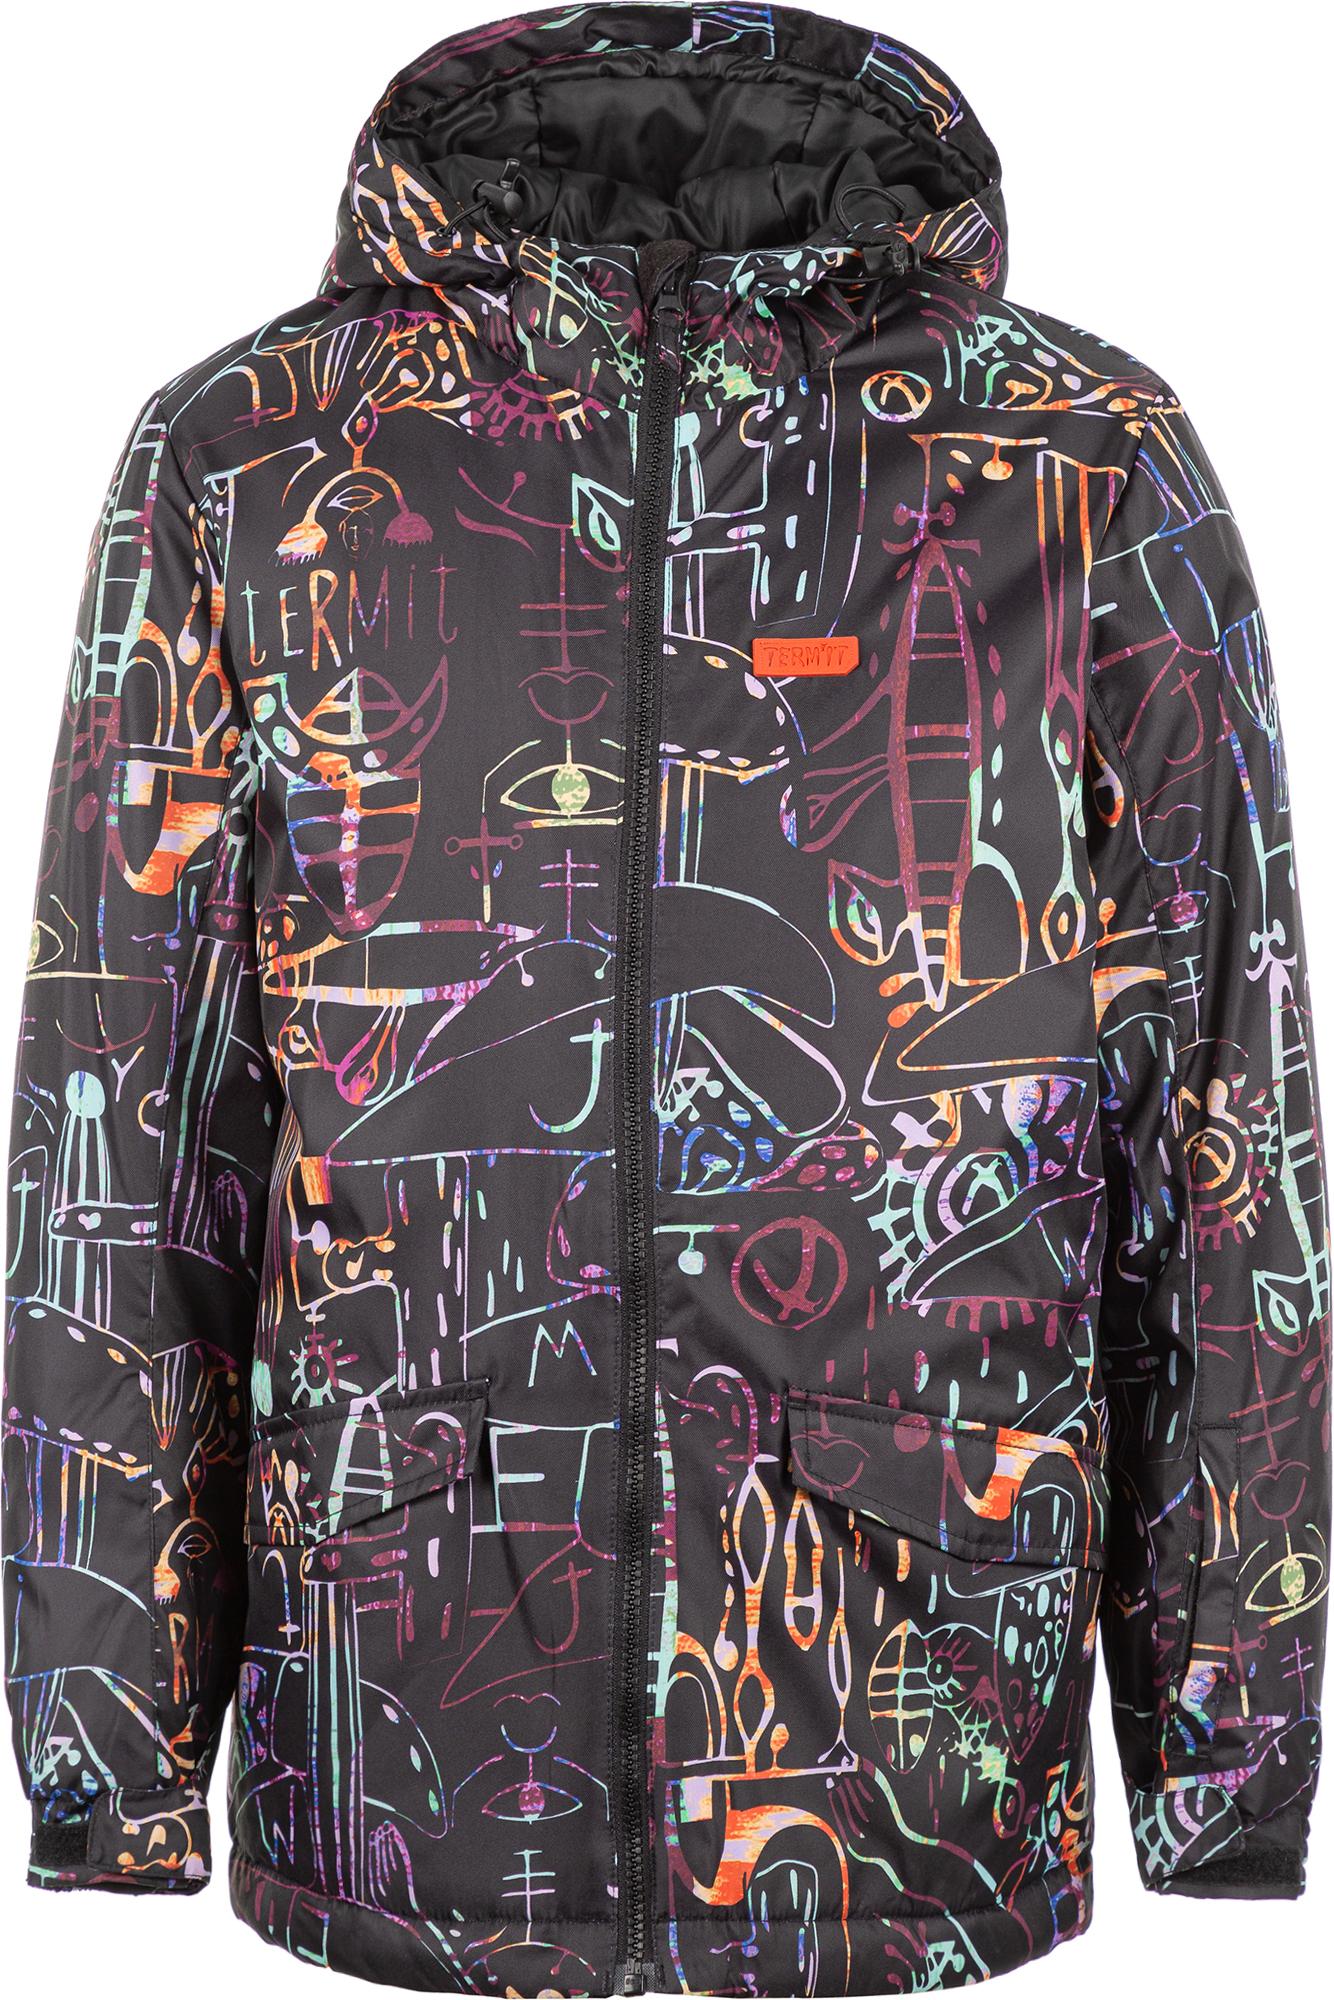 Termit Куртка утепленная для мальчиков Termit, размер 170 куртка для мальчика acoola brandon цвет темно серый 20110130145 2000 размер 170